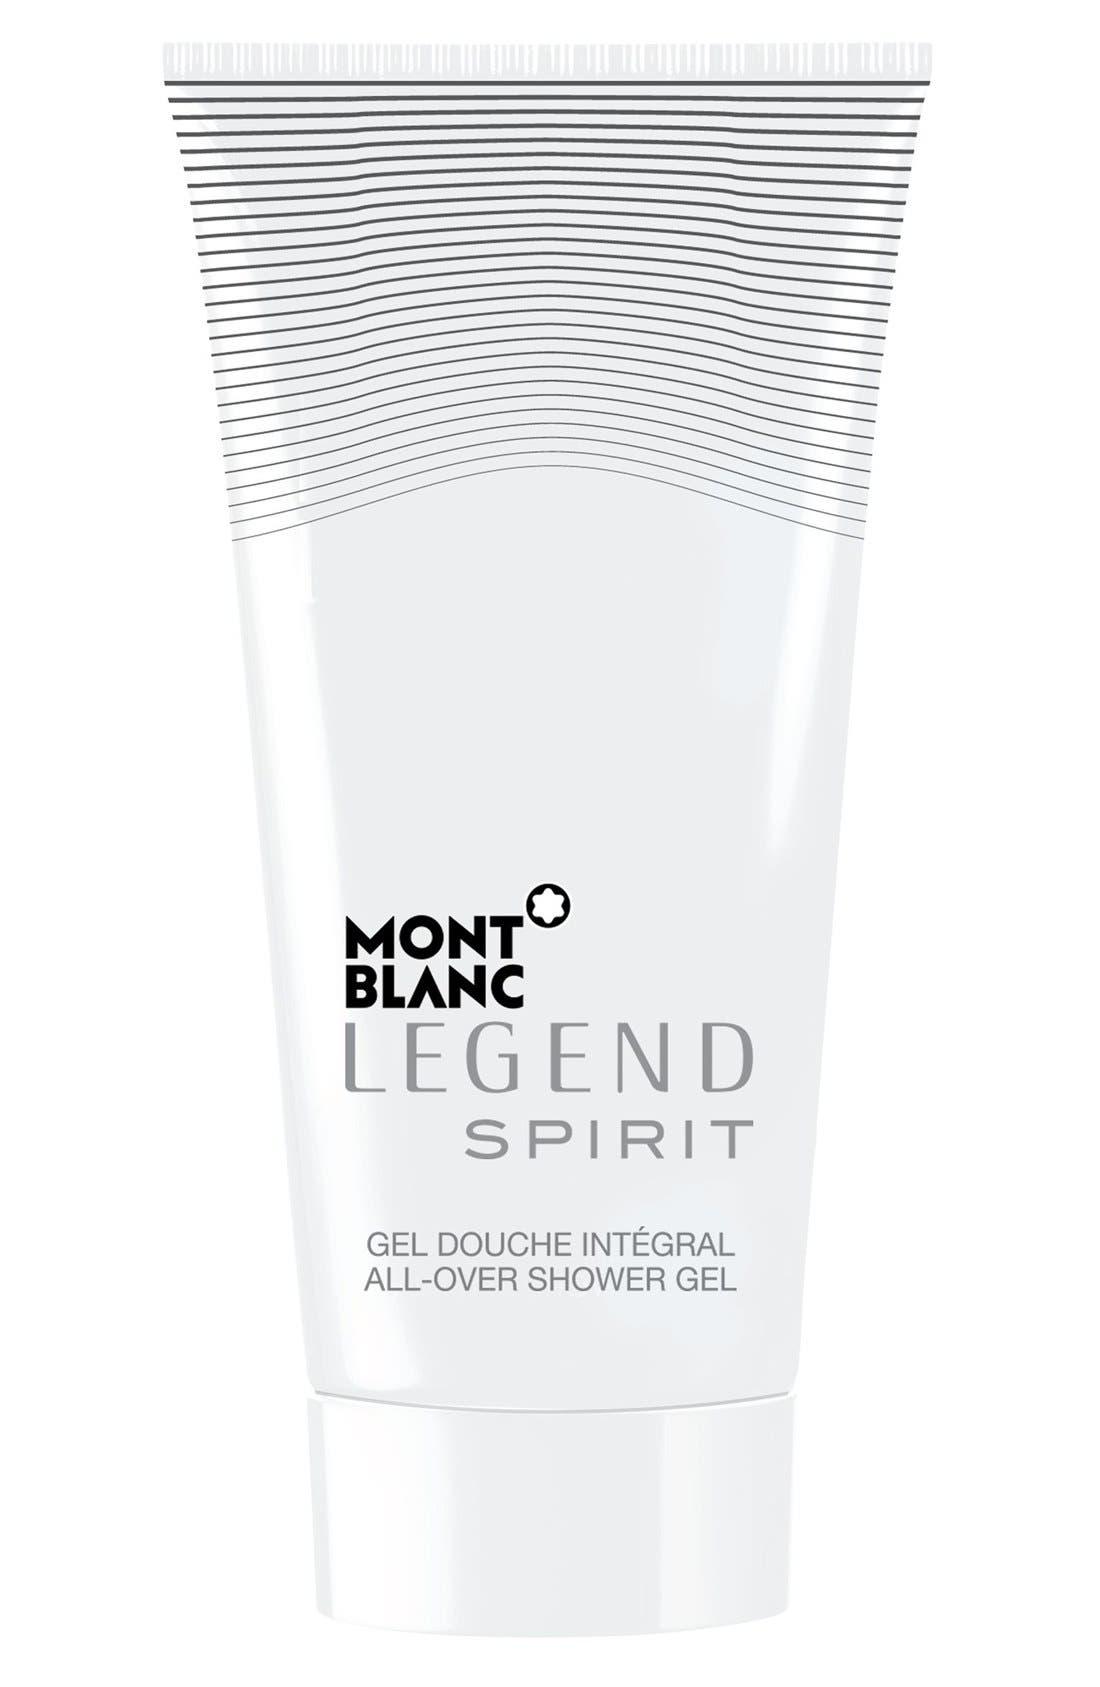 MONTBLANC 'Legend Spirit' All-Over Shower Gel